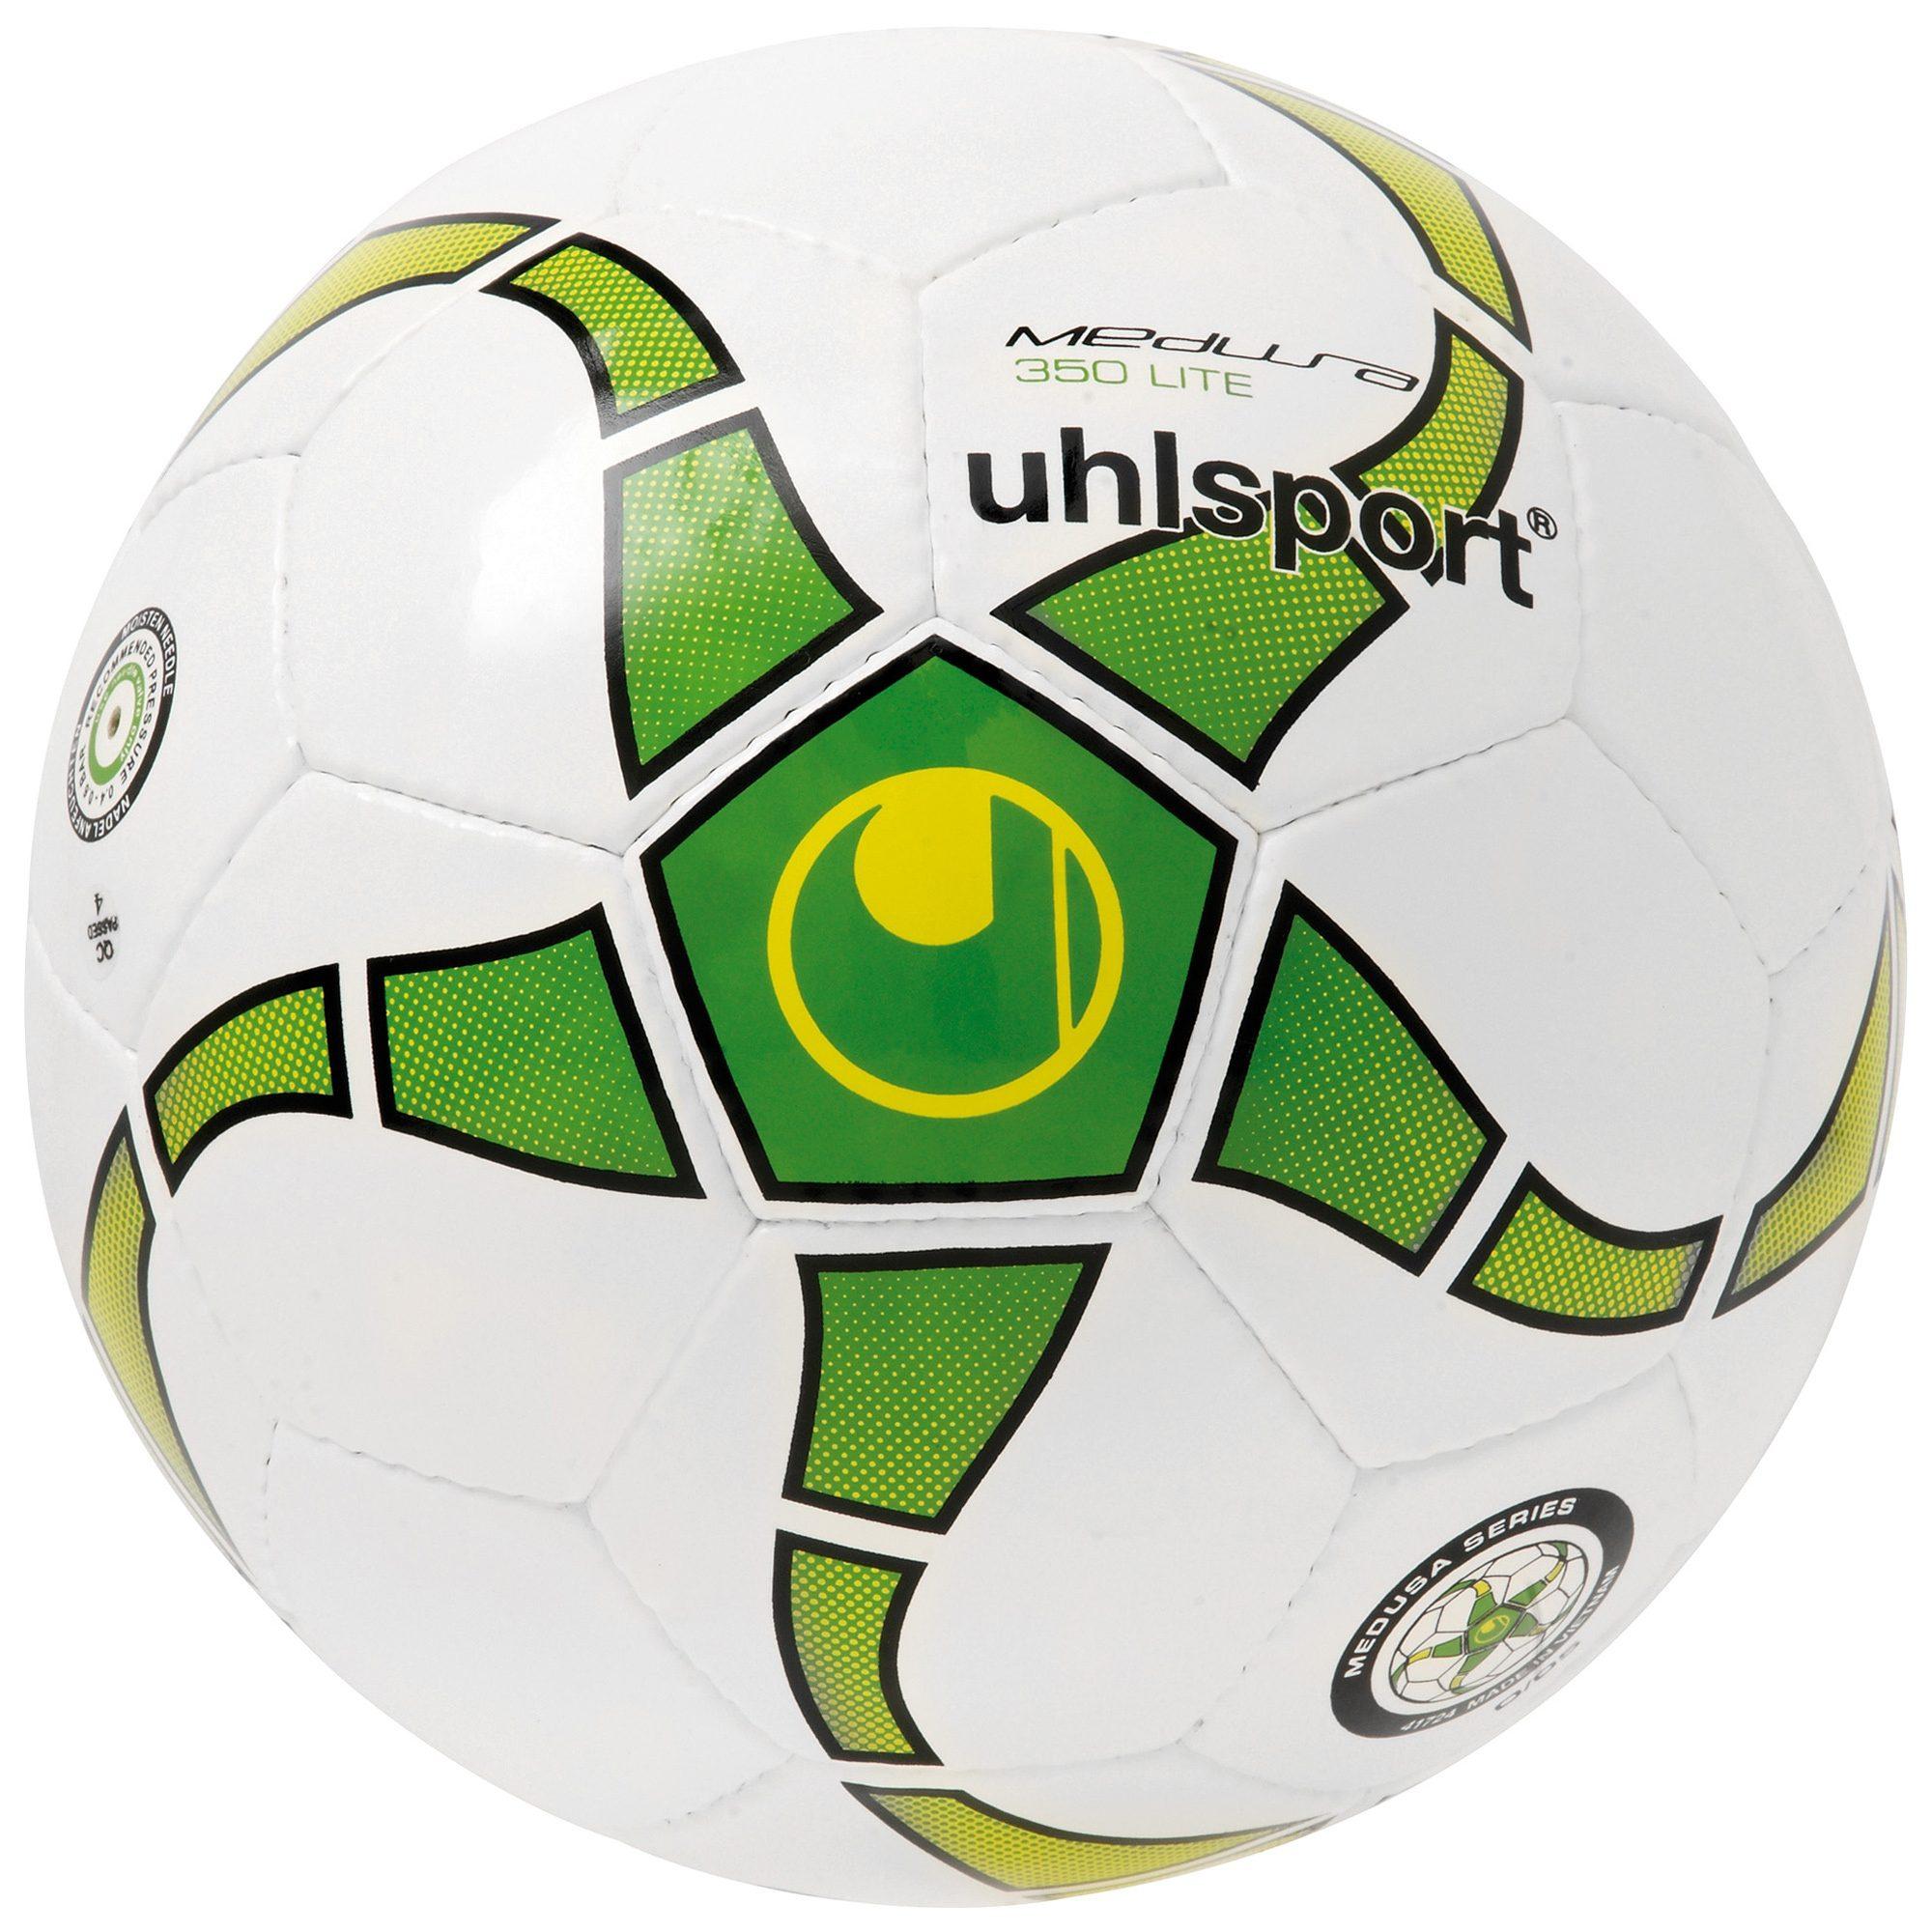 UHLSPORT Medusa Anteo 350 Lite Fußball